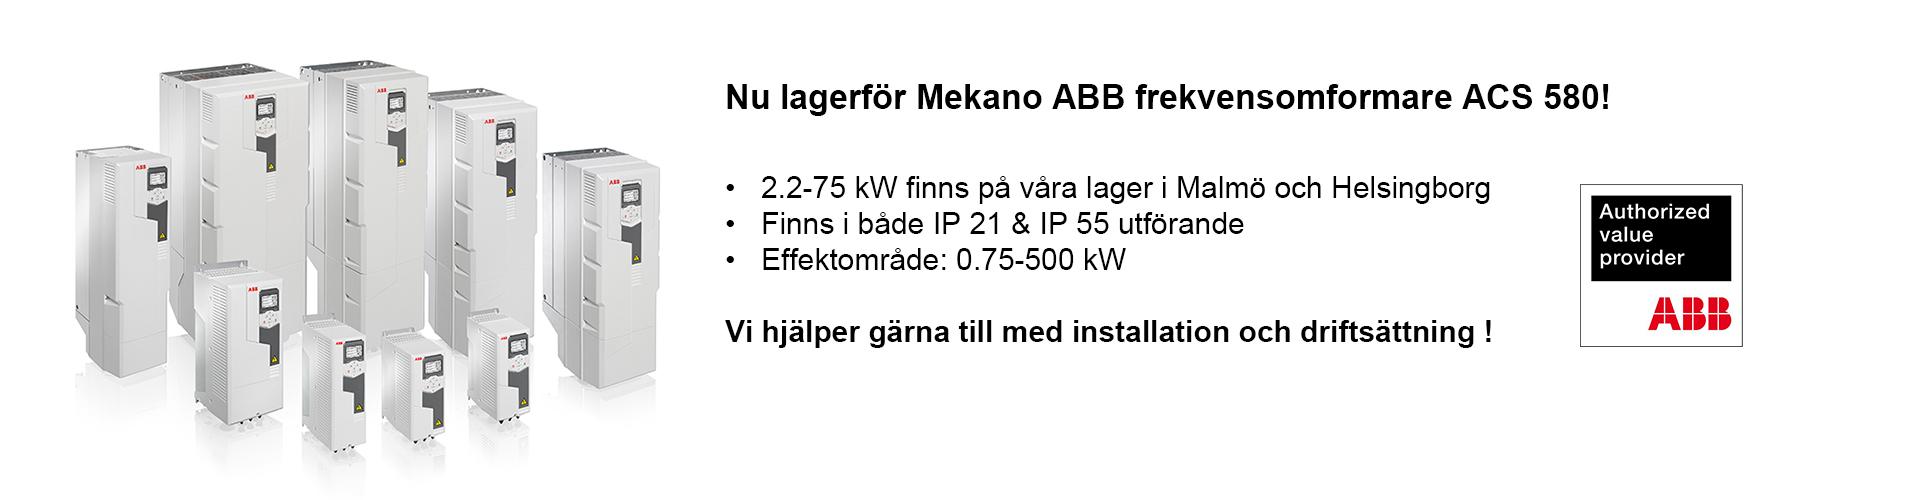 Mekano ABB Frekvensomformare